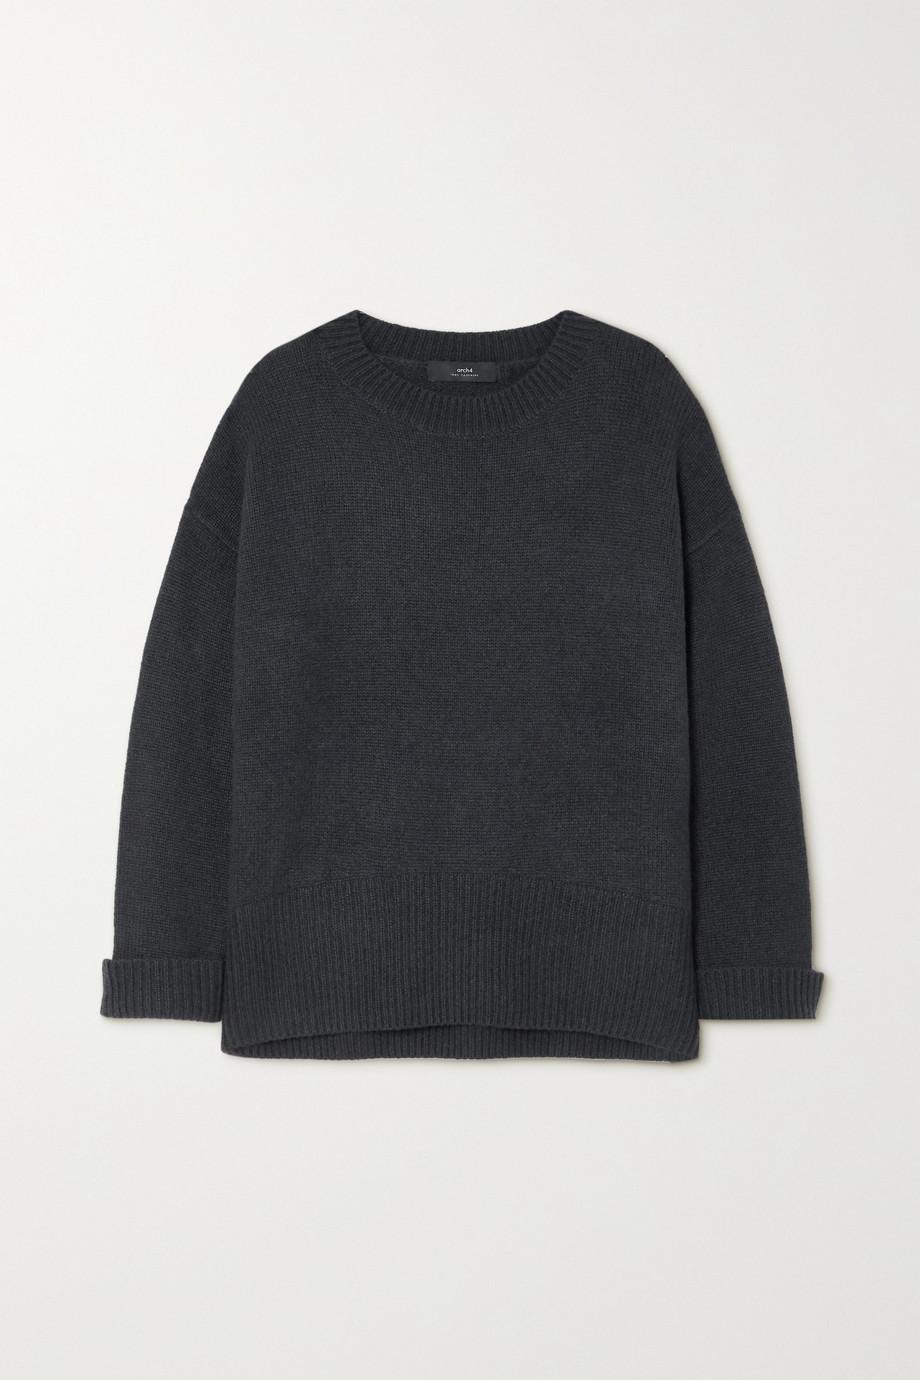 Arch4 Knightsbridge cashmere sweater